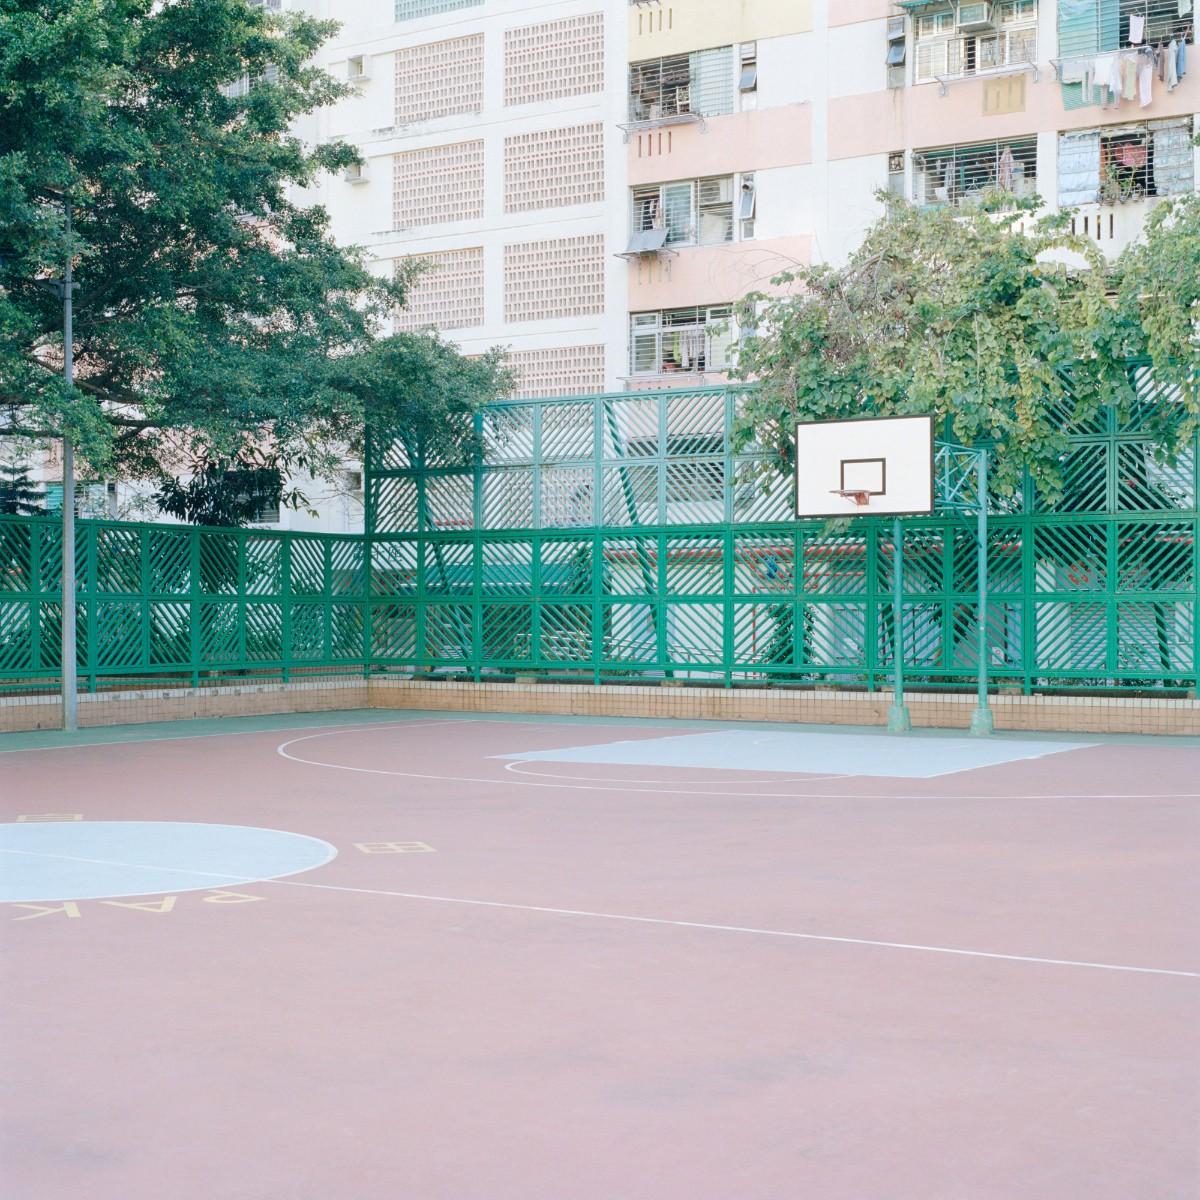 ward-roberts-courts-02.4-0910d74dae3e04402e8336f70a1567c1